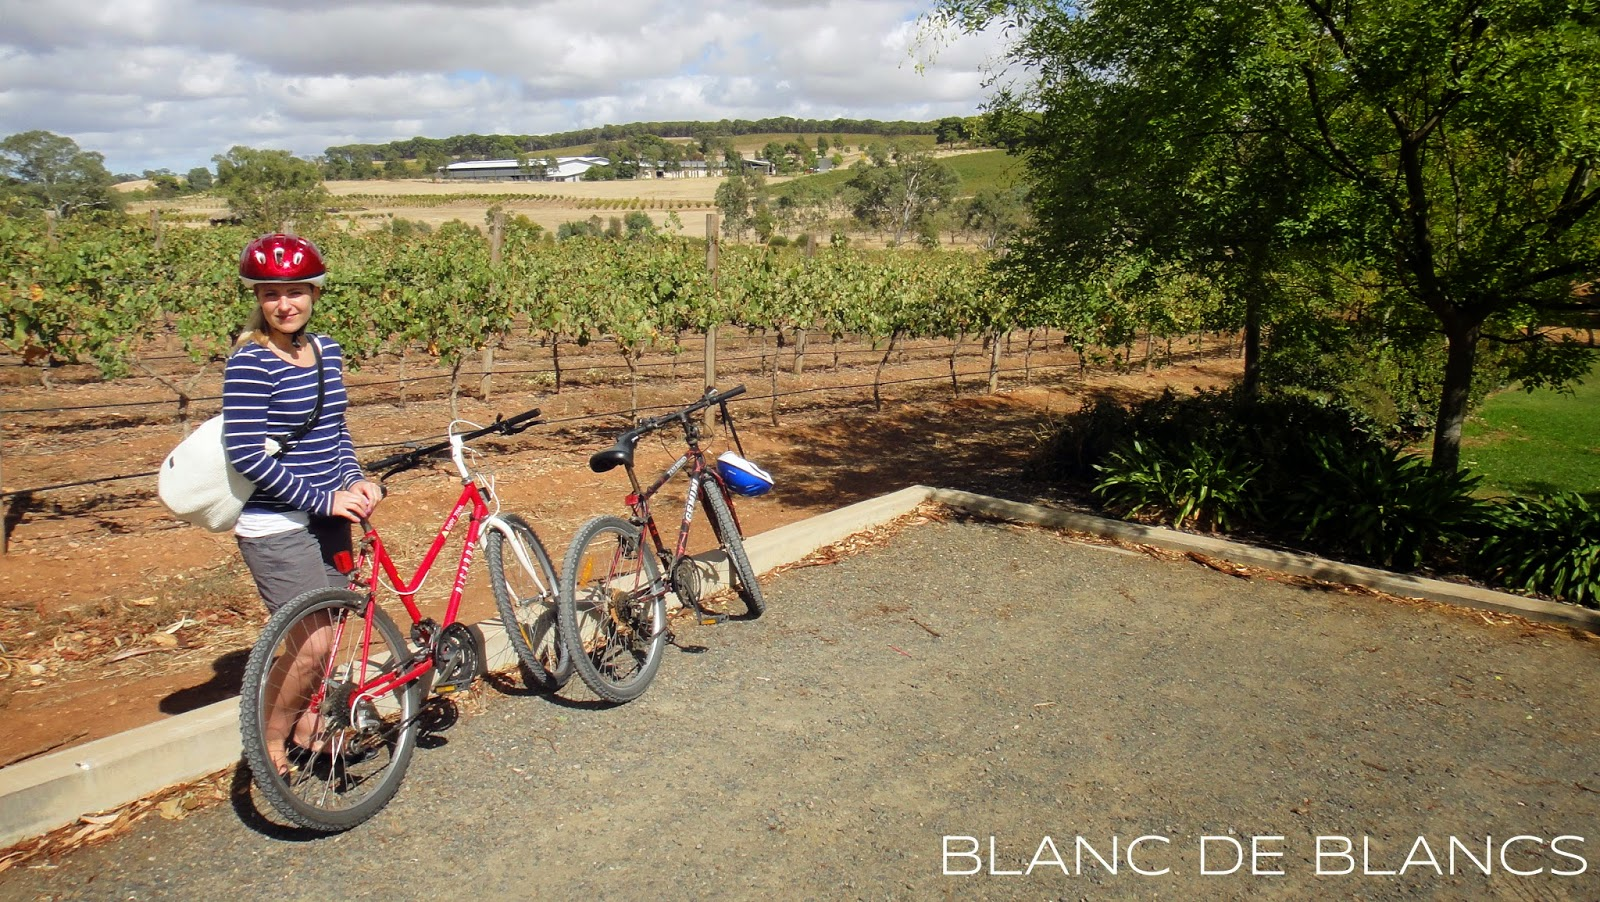 Viinimatkalla Barossa Valleyssa - www.blancdeblancs.fi